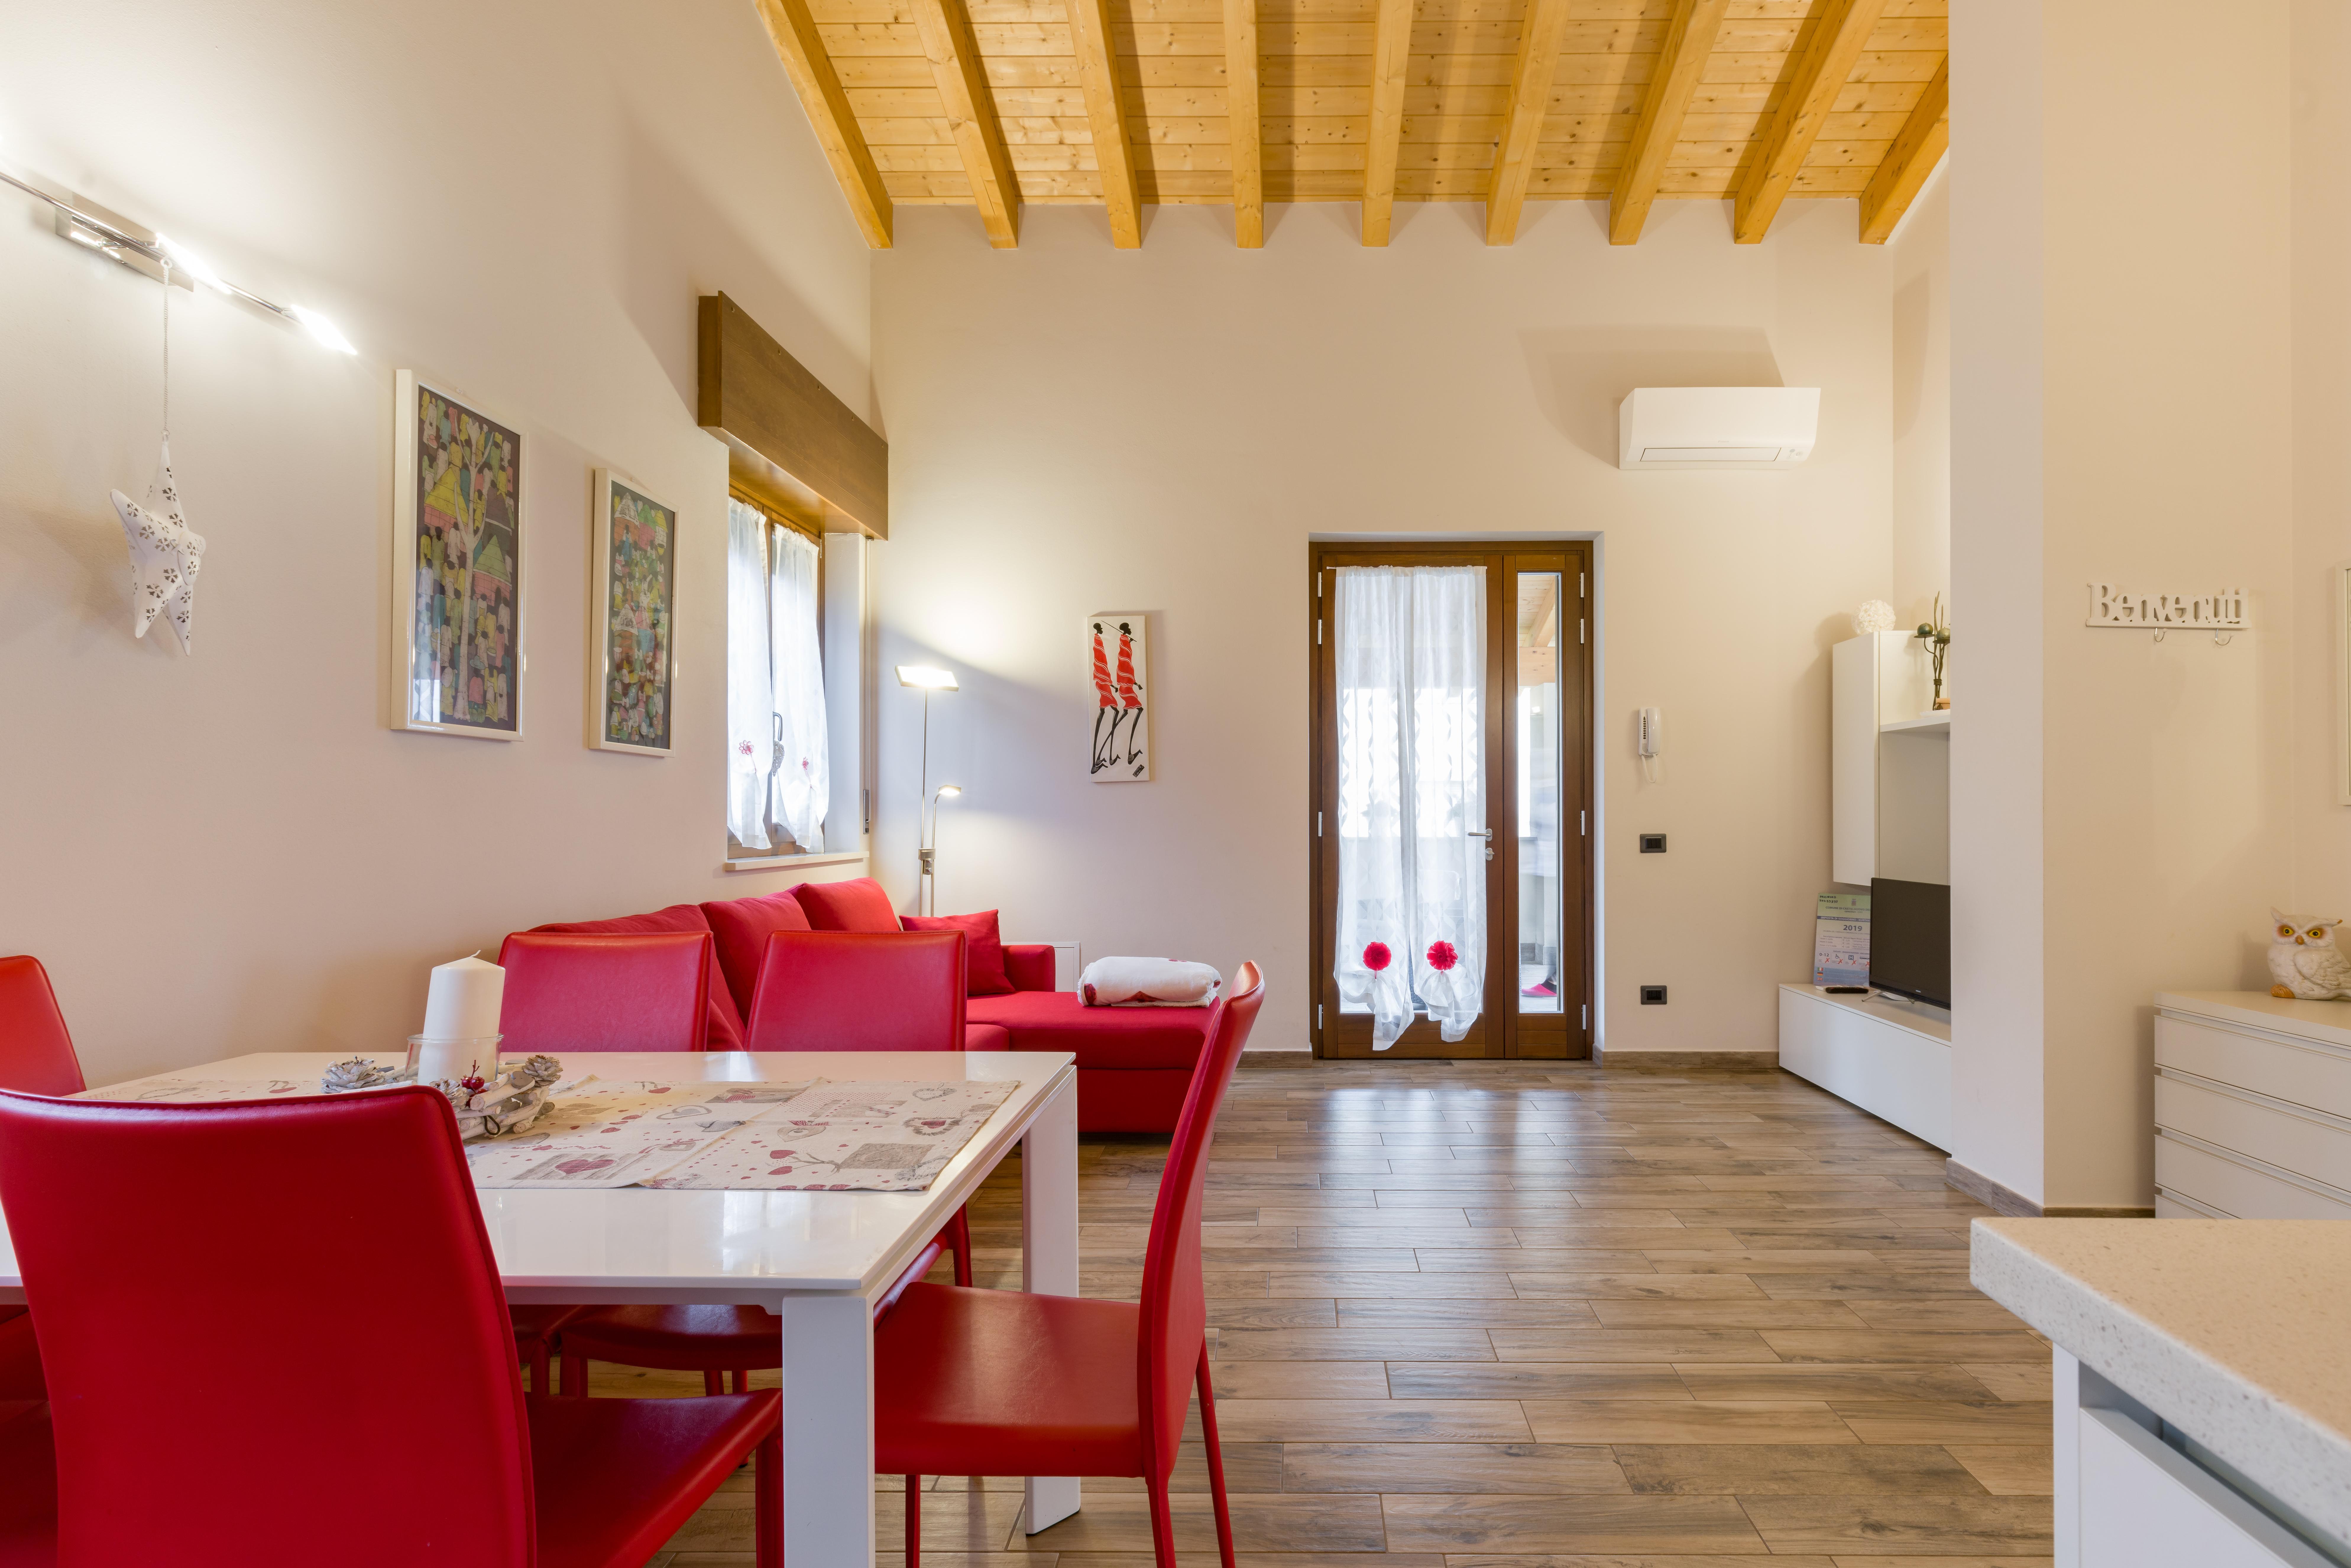 New Modern Appartment Near Gardaland Apartments For Rent In Castelnuovo Del Garda Veneto Italy